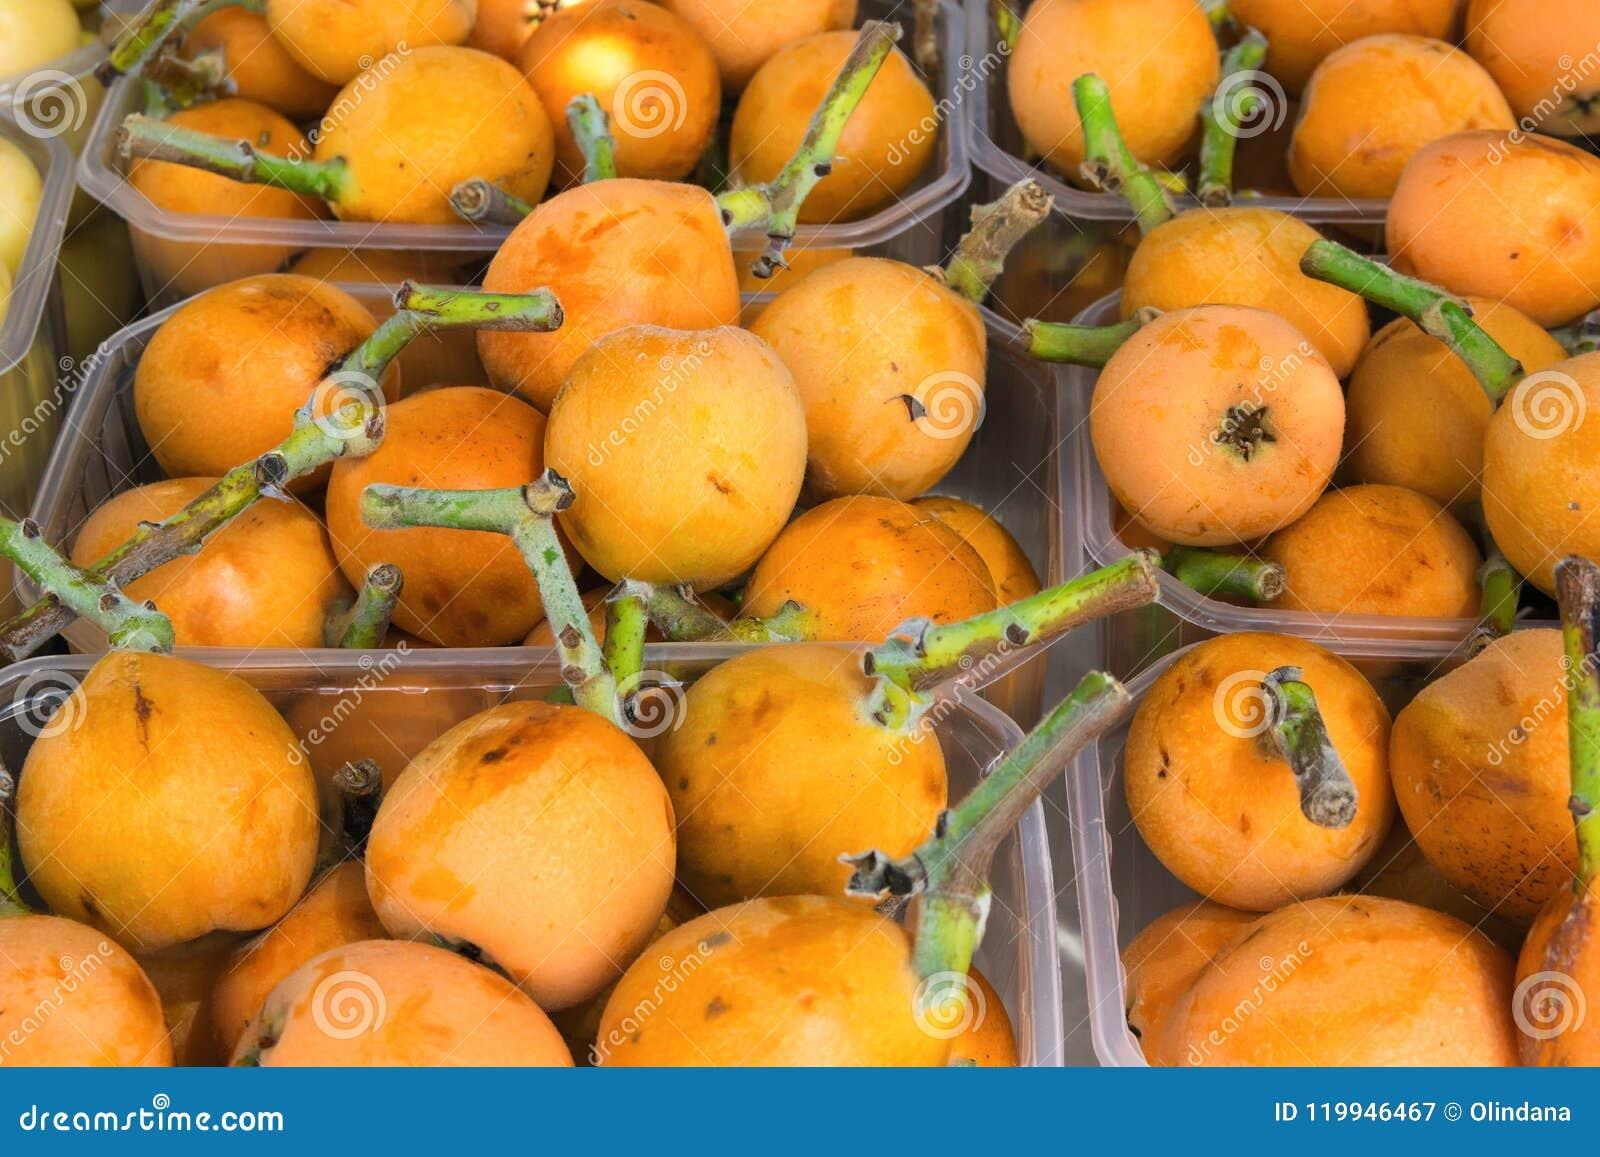 Ripe Organic Vivid Orange Medlars in Boxes at Farmers Market in Spain. Bright Vibrant Vivid Colors. Vitamins Superfoods Harvest